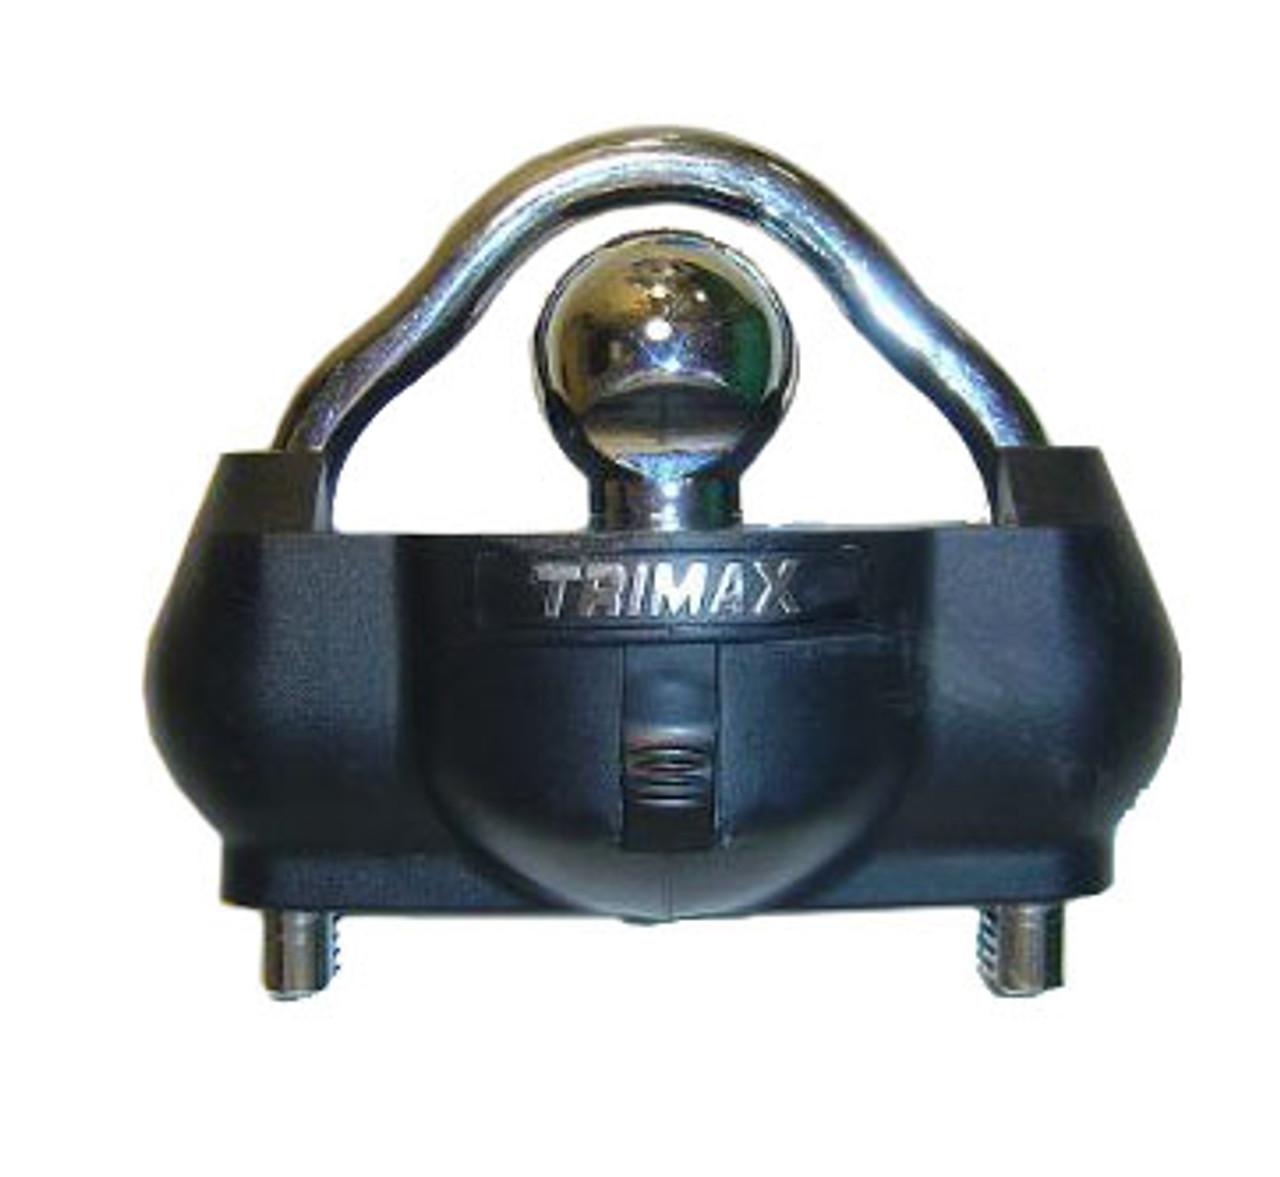 UMAX100KEYED --- Trimax™ Universal Trailer Coupler Lock - Keyed Alike